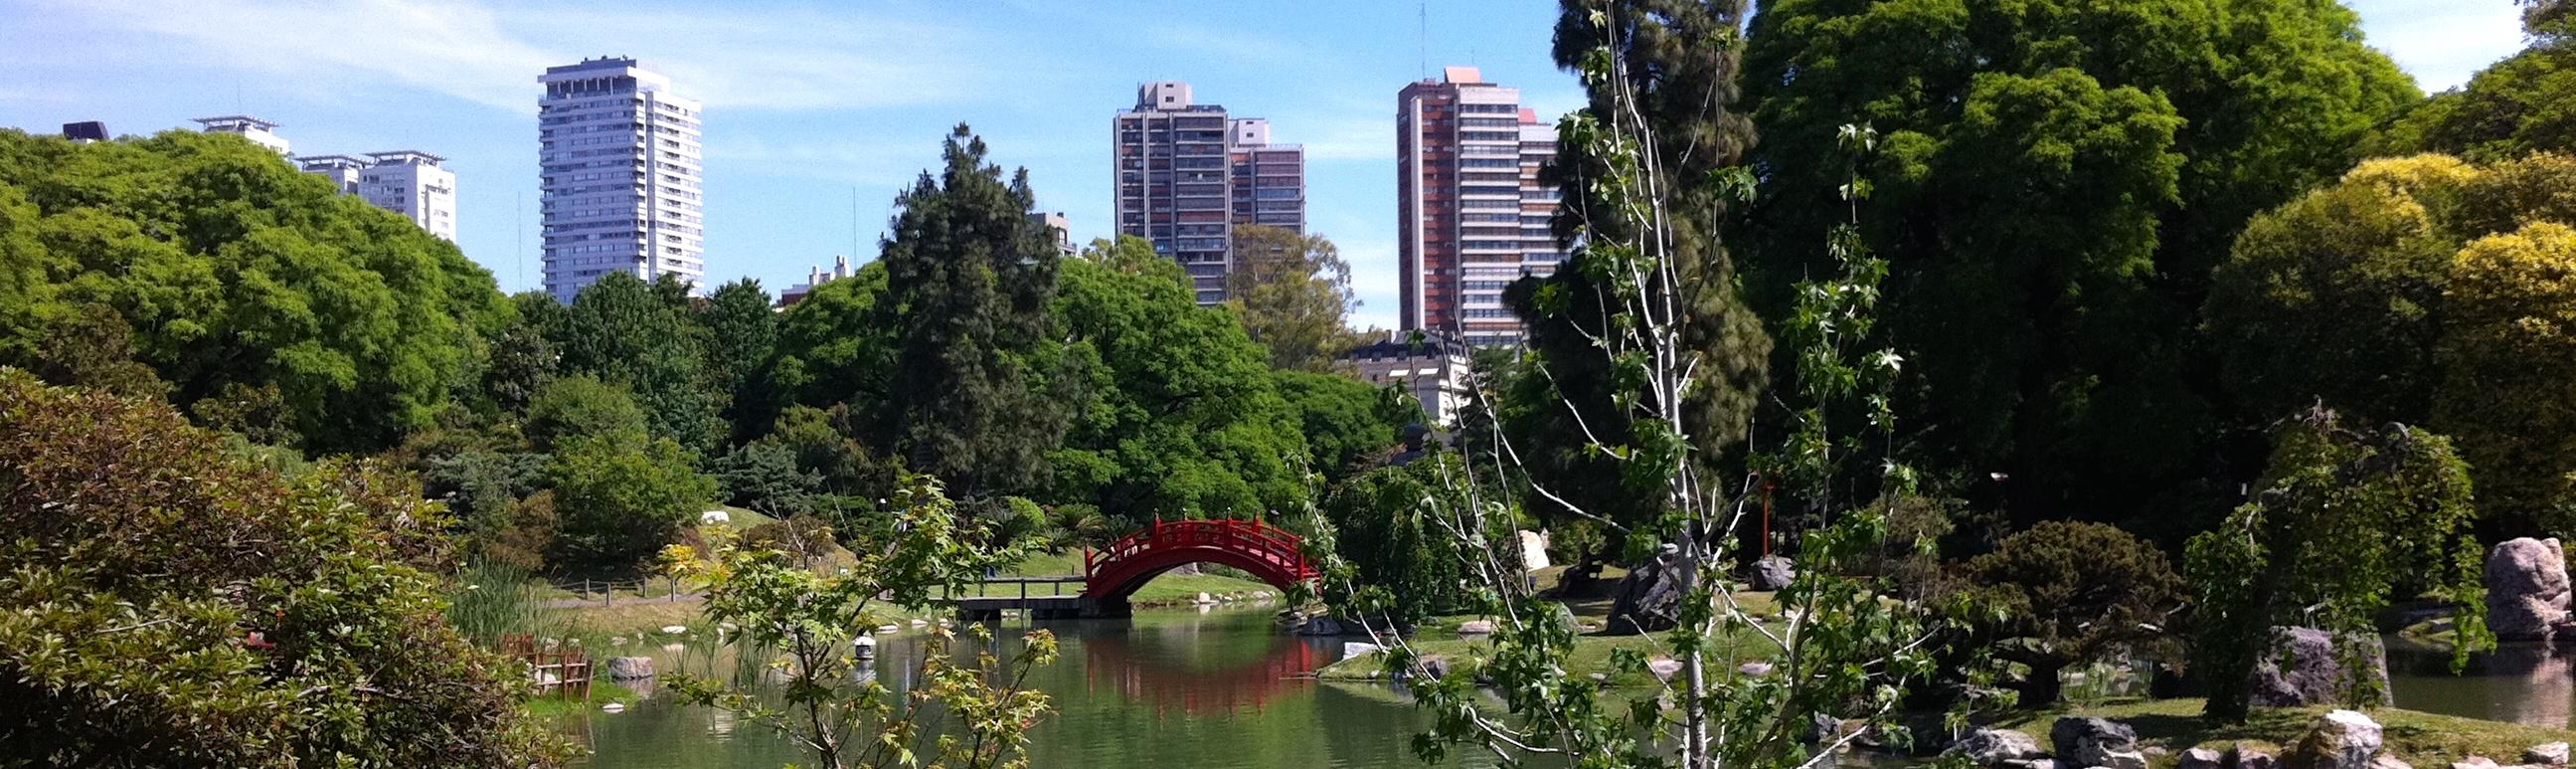 Jardin Japones, Buenos Aires